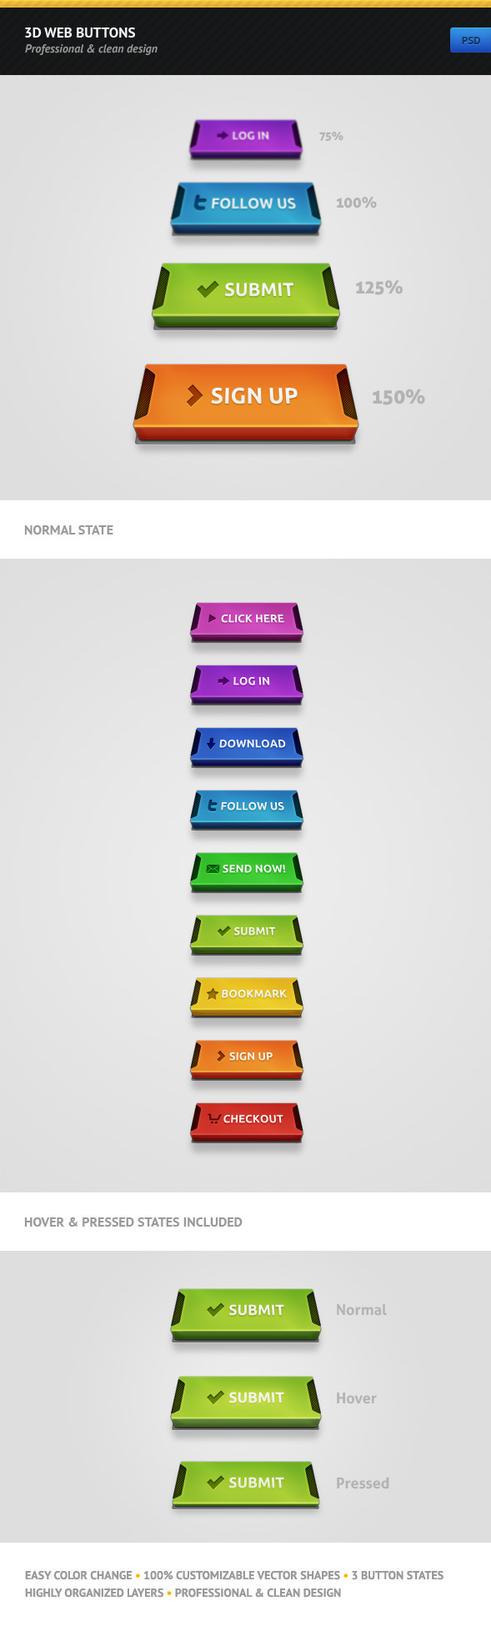 3D Web Buttons by erigongraphics